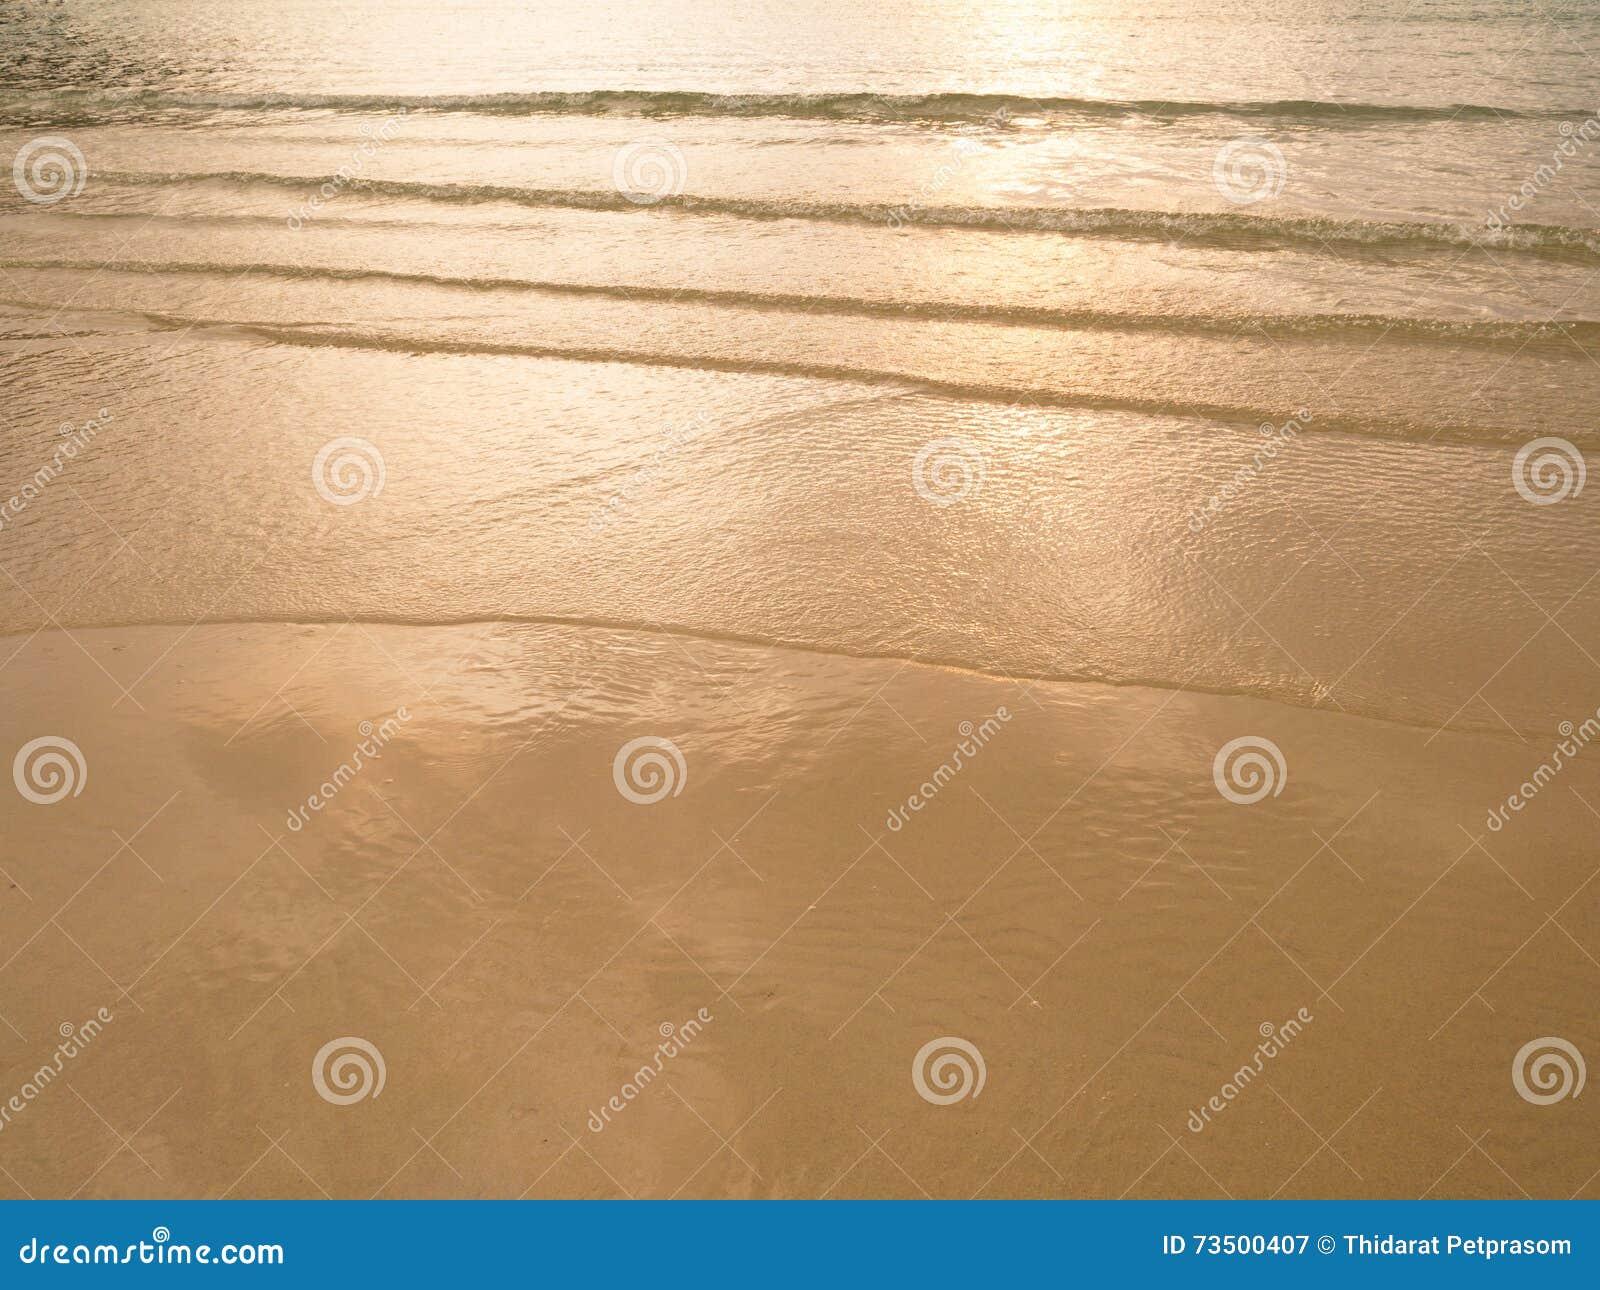 Soft Orange Color Soft Sea Wave Sand Beach At Sunset  Sunriseorange Color Of Sea